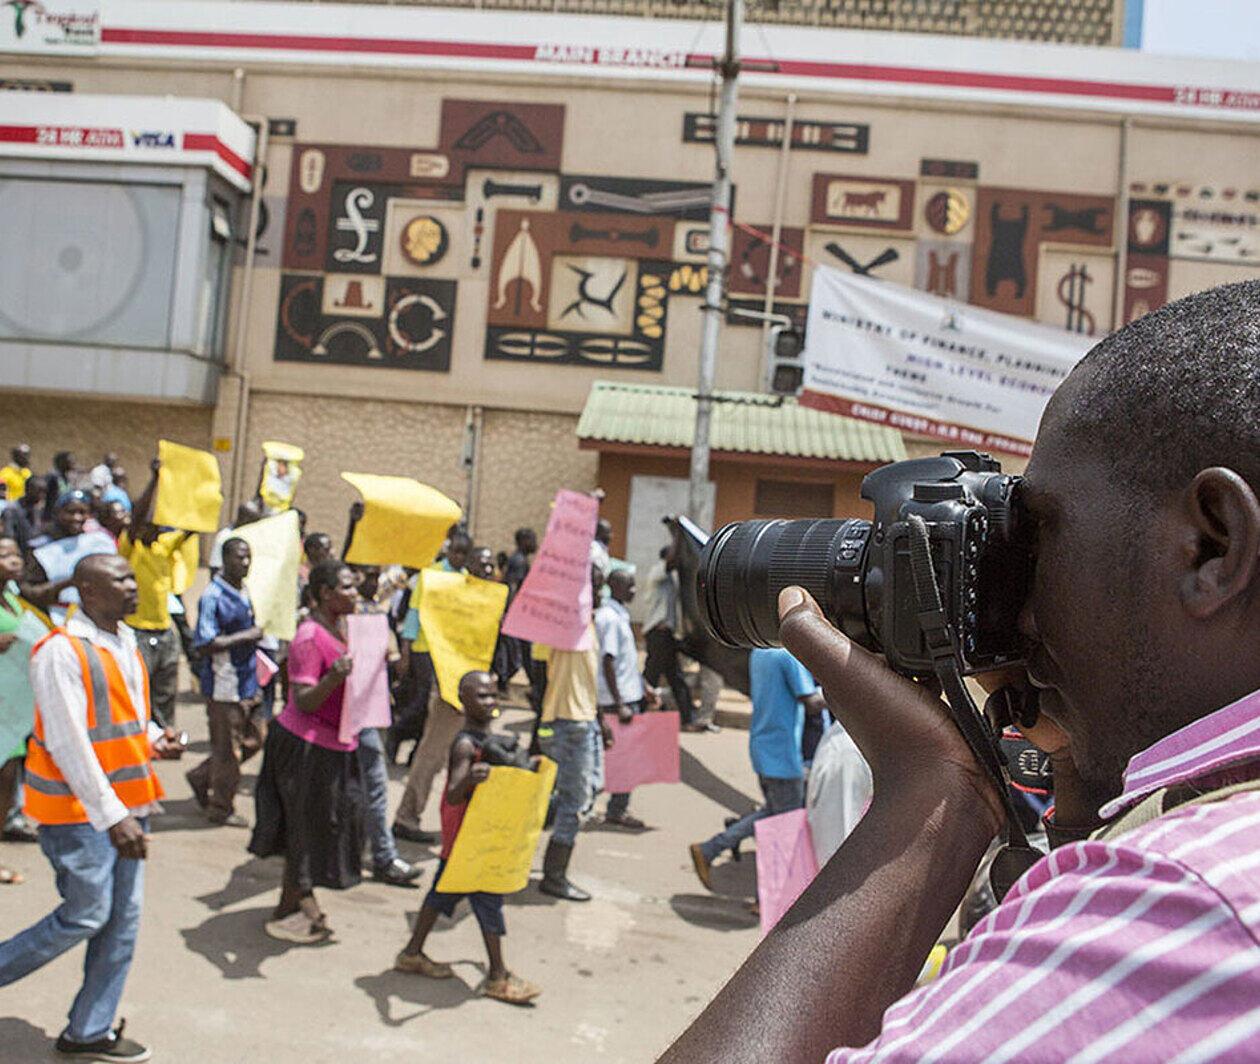 Why Does Media Matter for Development?